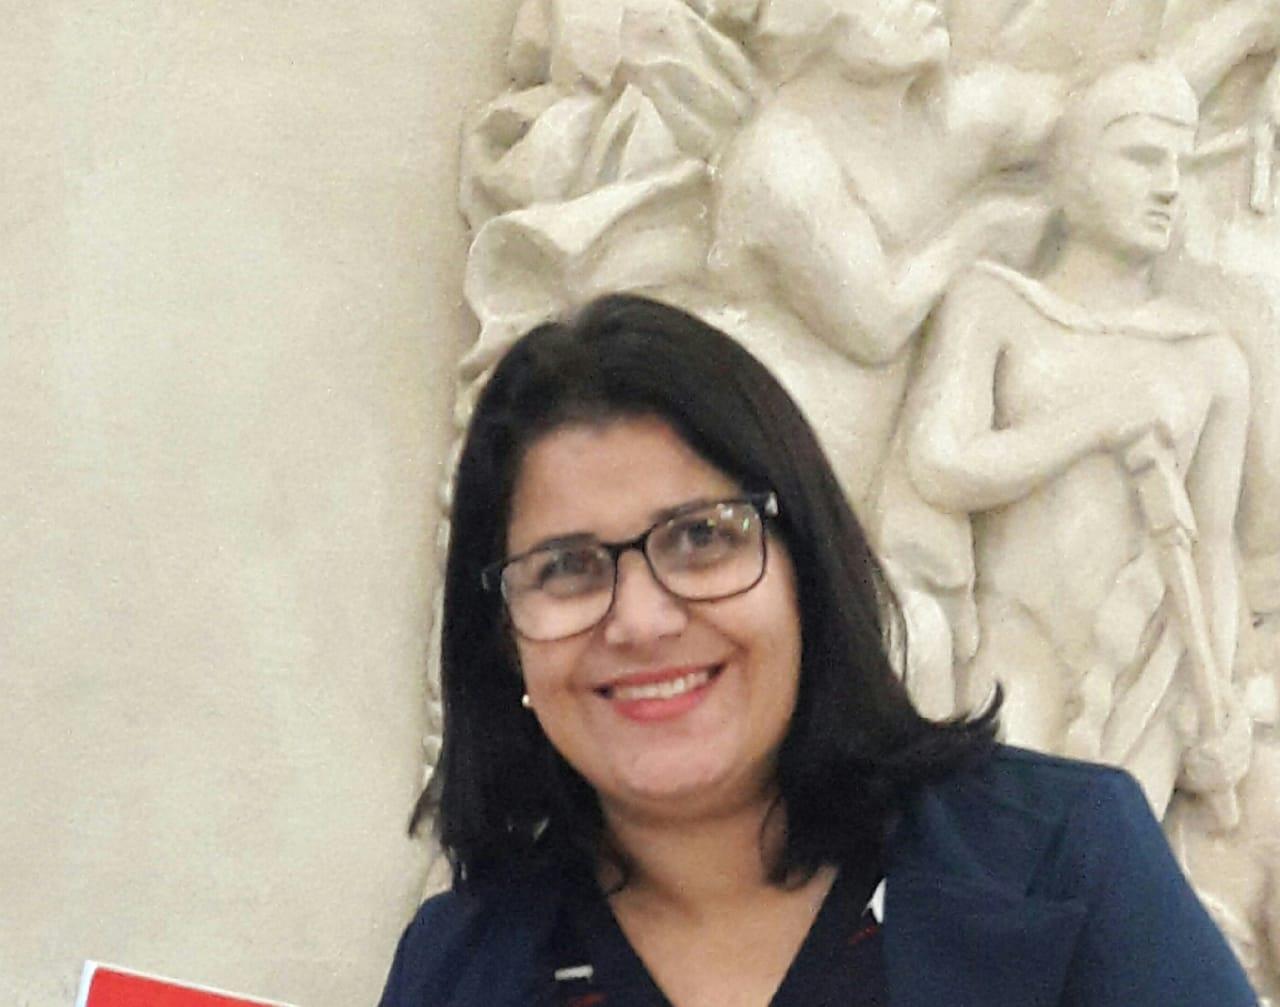 Luciana Cristina da Silva Evangelista